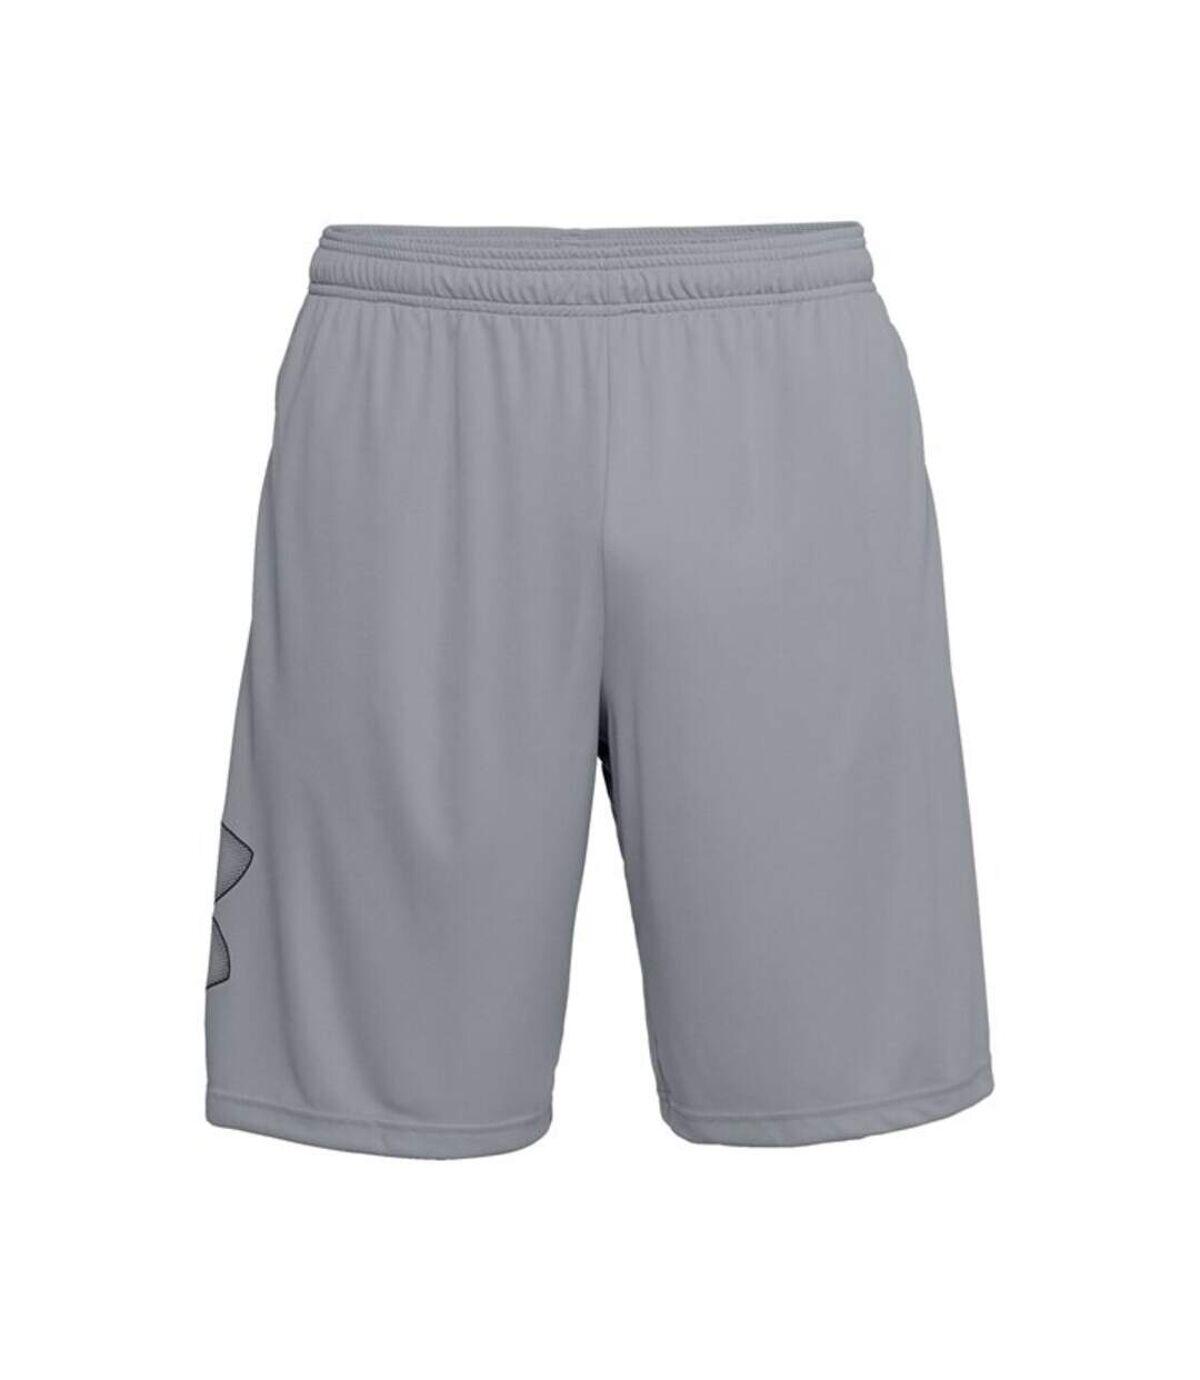 Under Armour Mens Tech Shorts (Steel Grey/Black) - UTRW7748